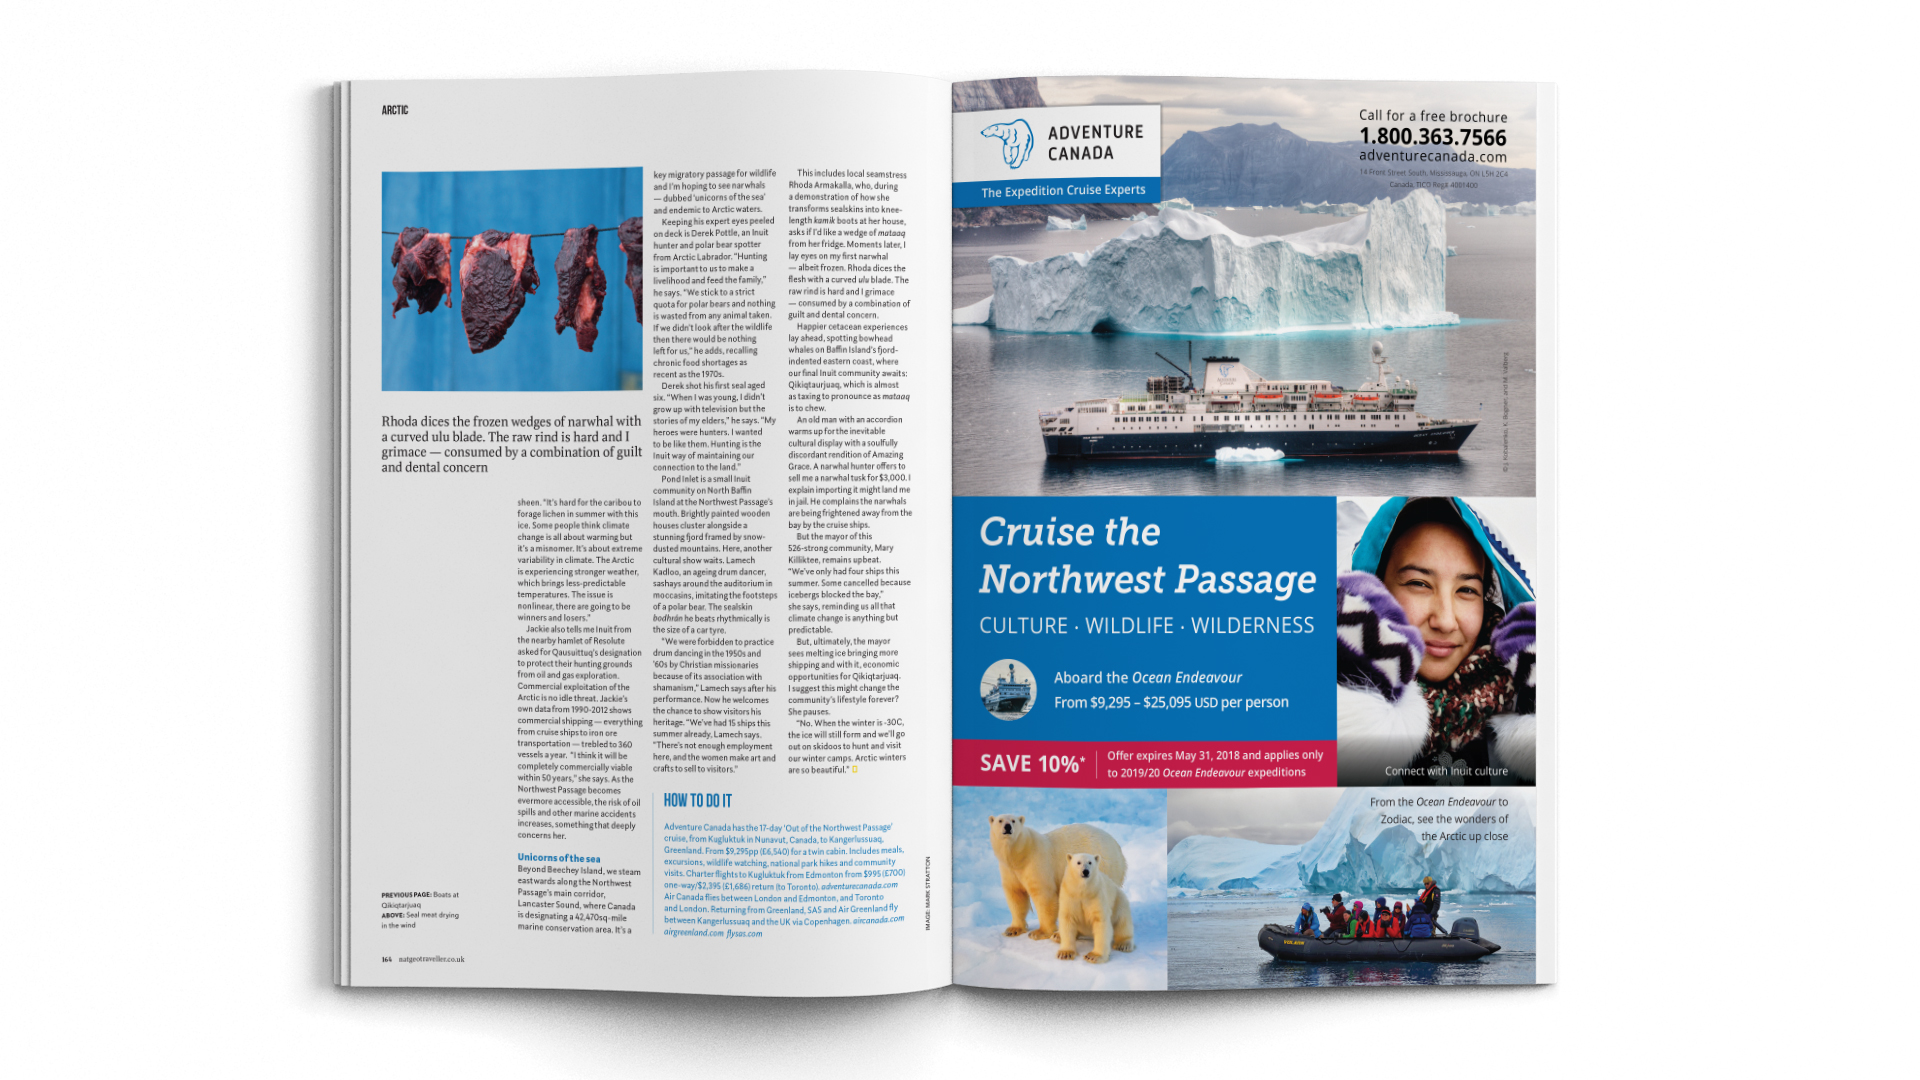 A4-Magazine-DPS-NGT-TT-Report-Northwest-Passage-3